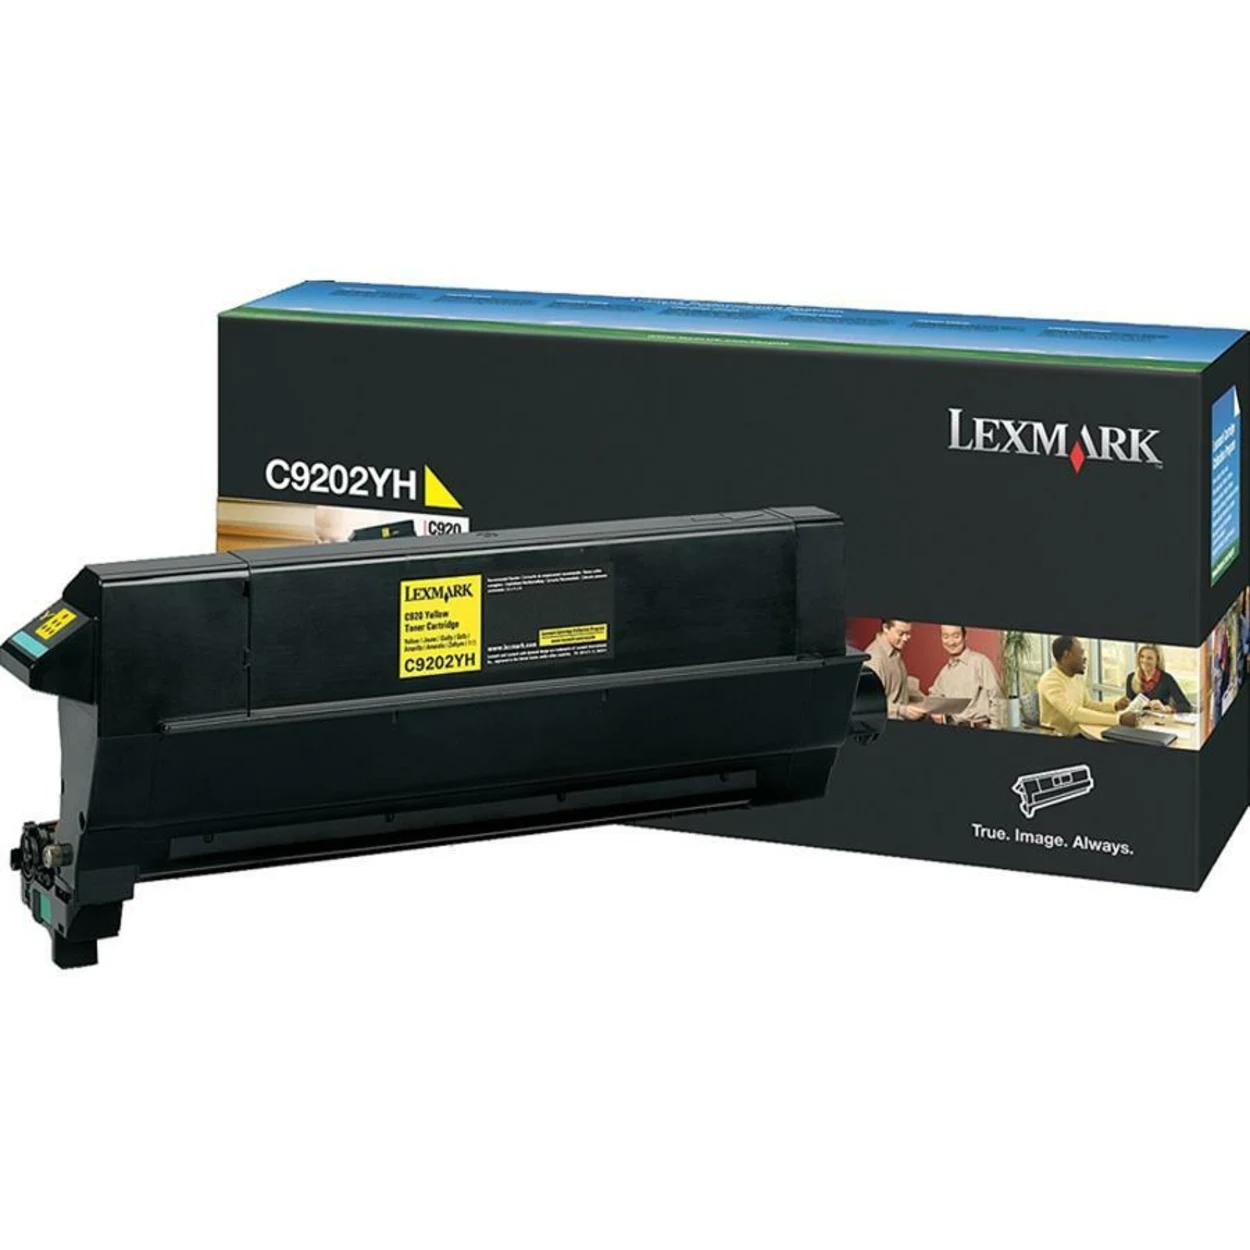 Original Lexmark C9202YH Laser Toner Cartridge  Yellow